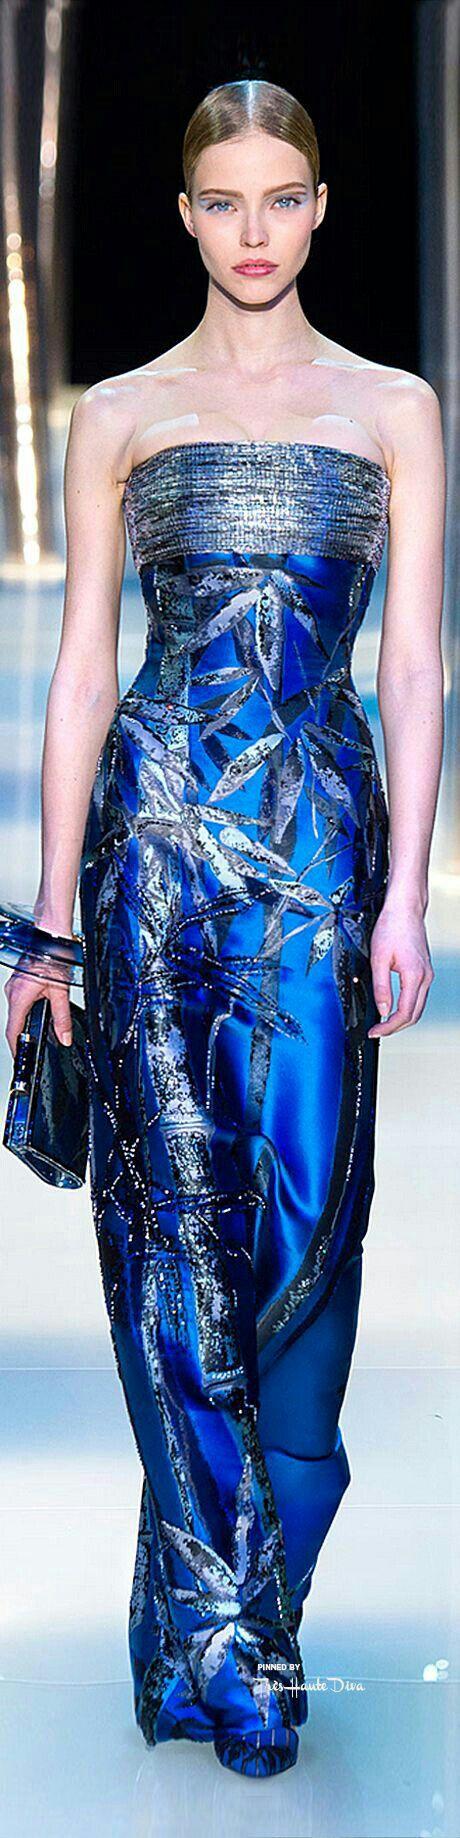 Pin by marika kate on stunning maxi dresses pinterest maxi dresses